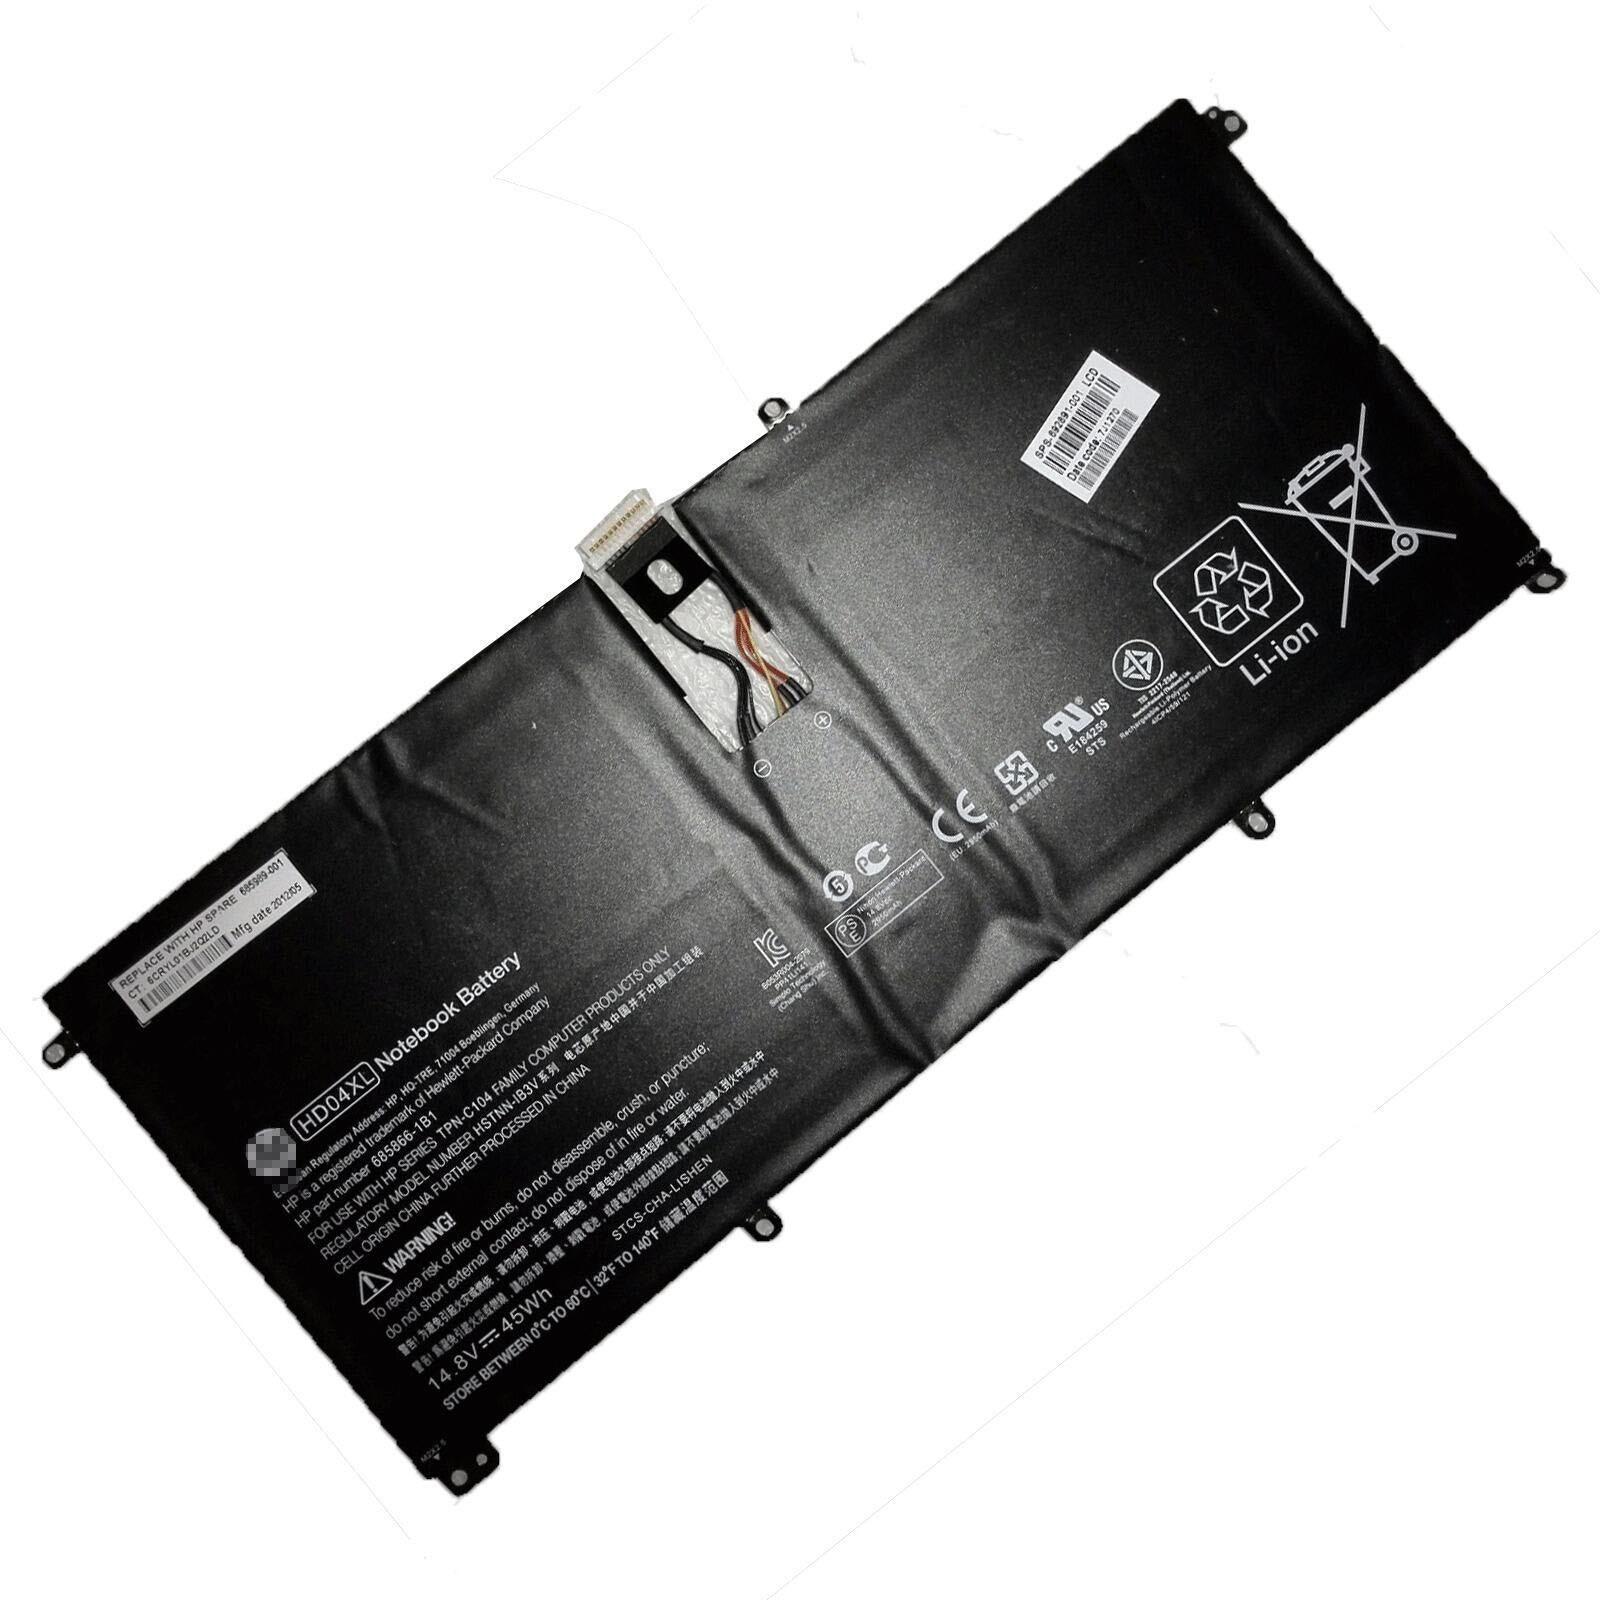 14.8V 2950mAh 45Wh Genuine Hp Envy Spectre XT Pro 13-b000